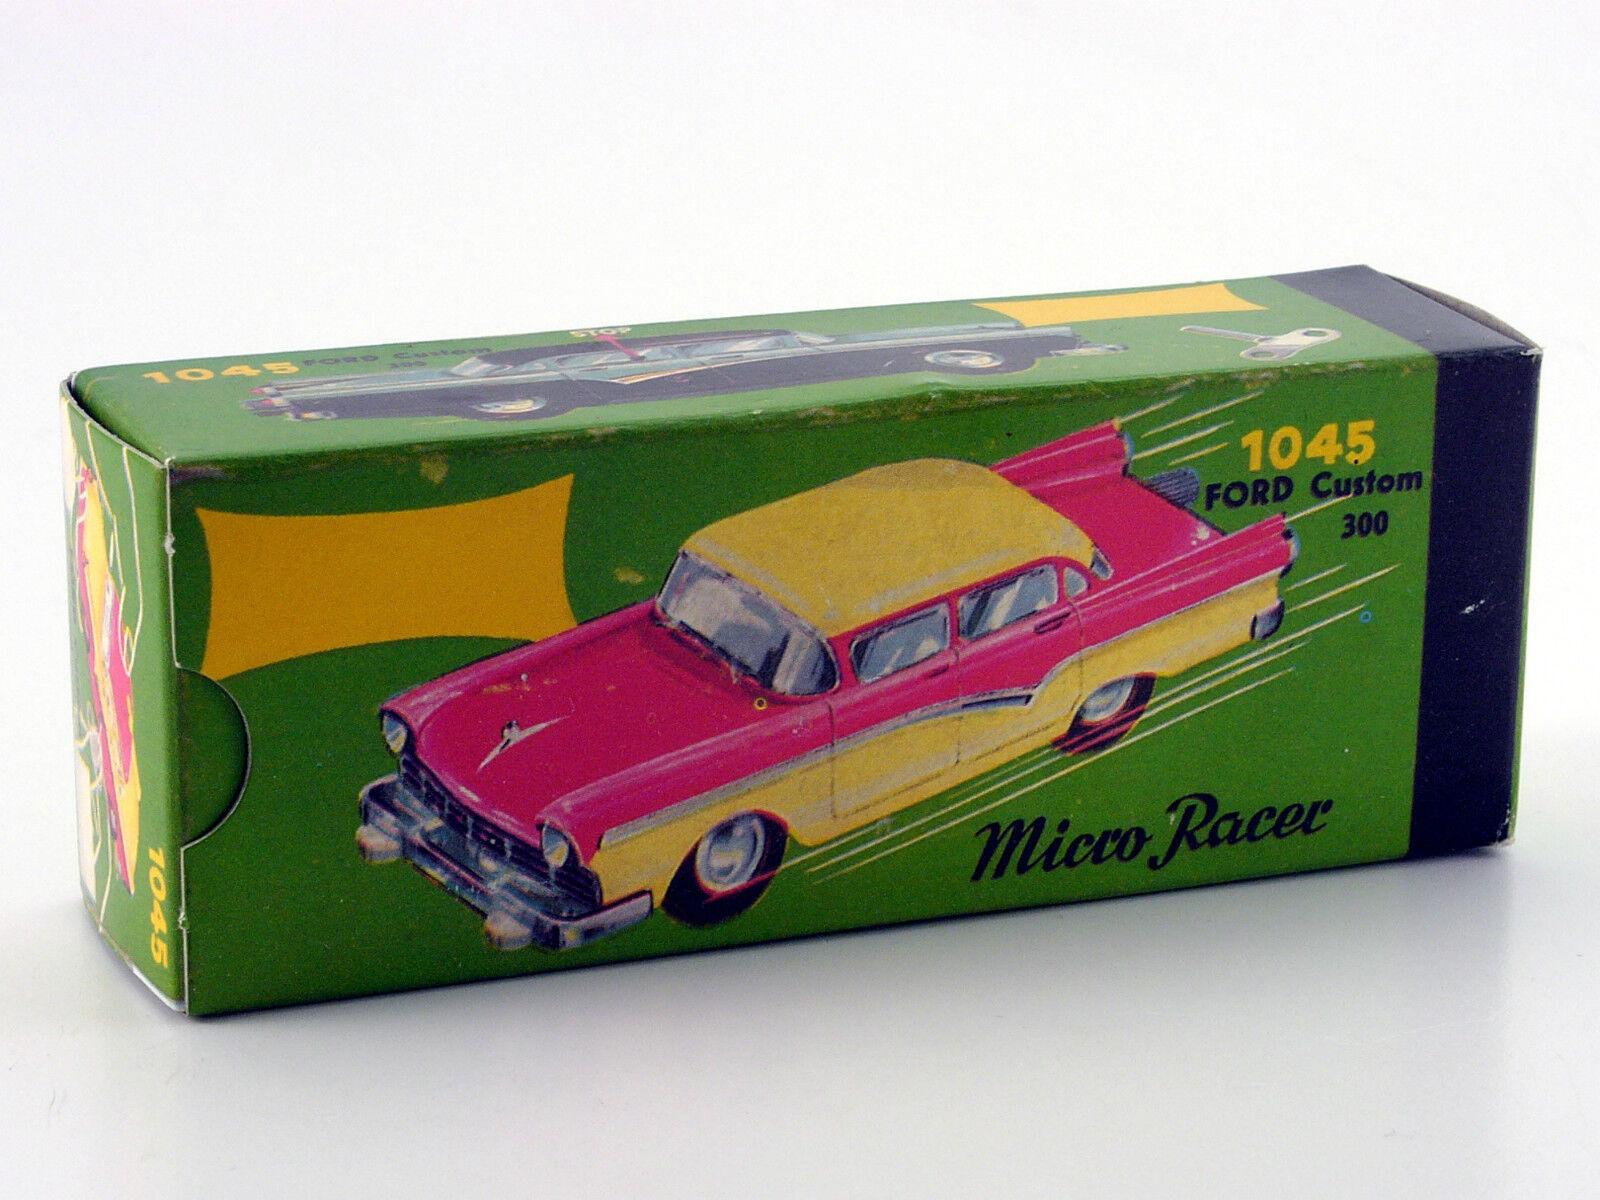 Lilliput Lilliput Lilliput Micro-Racer Ford Fairlane red-yellow d70ff6